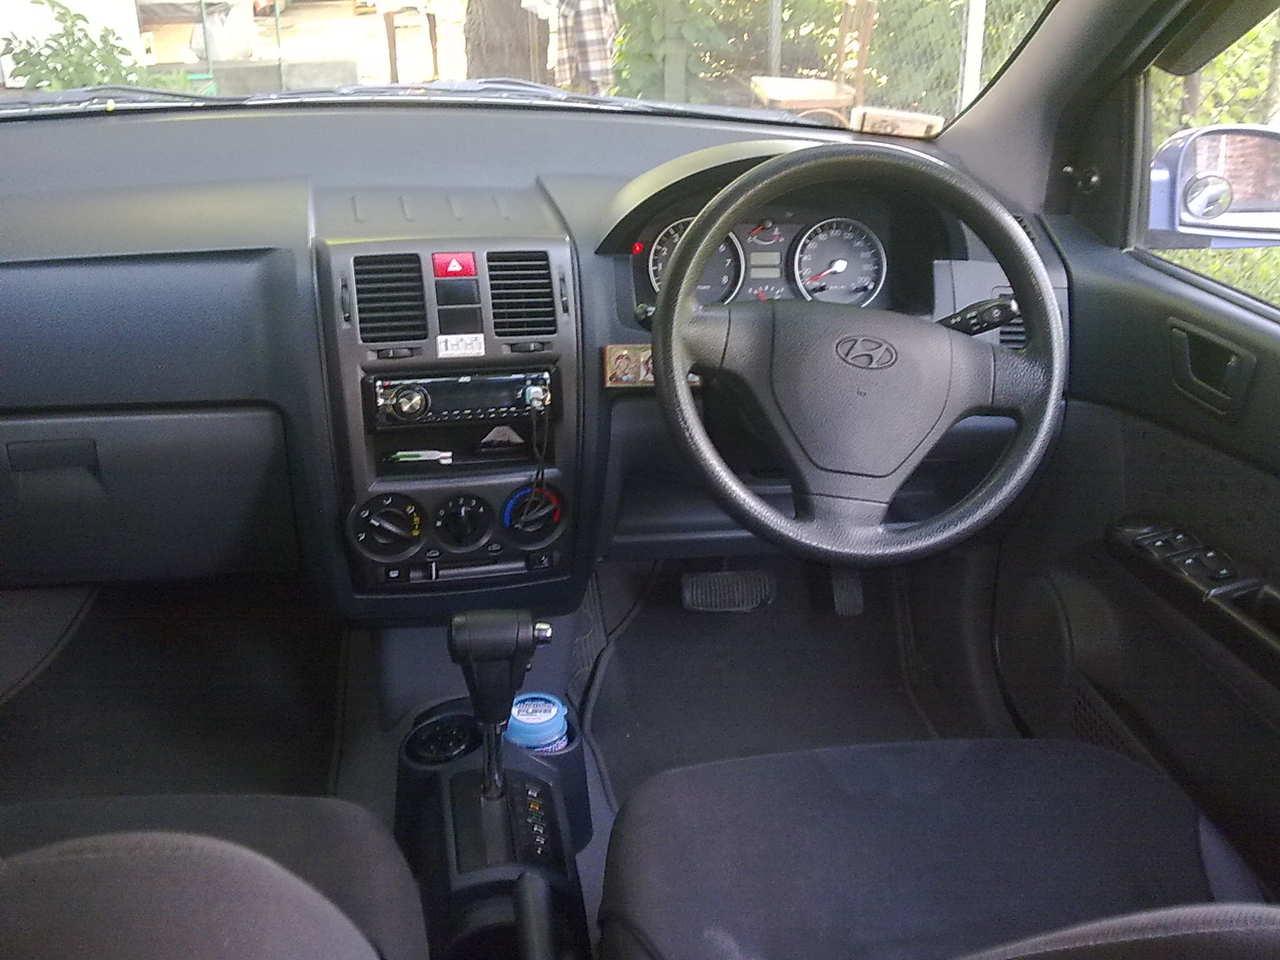 2003 Hyundai Getz Specs  Engine Size 1 3  Fuel Type Gasoline  Drive Wheels Ff  Transmission